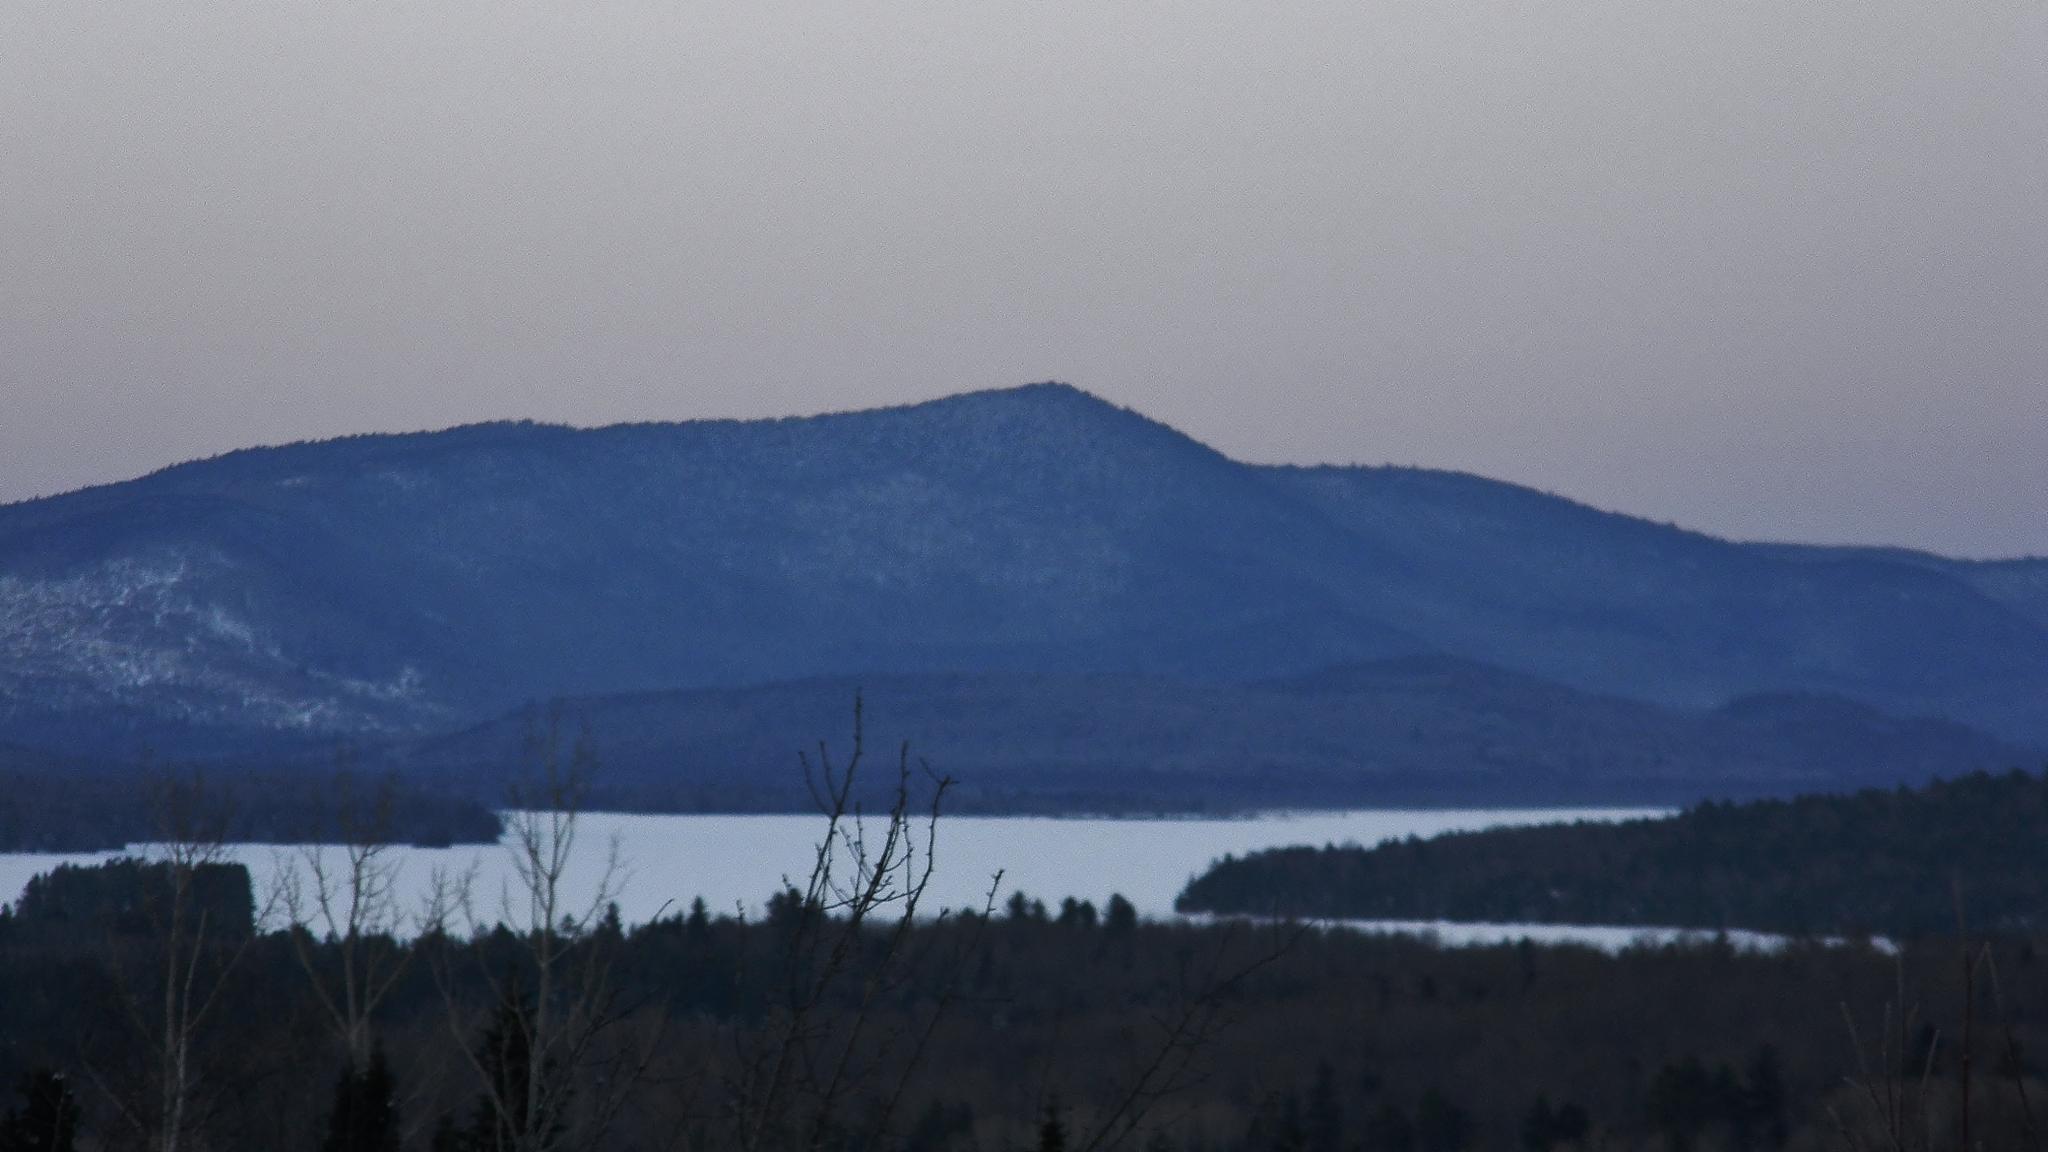 Mt. Dustan and Umbagog Lake by kbgarvey